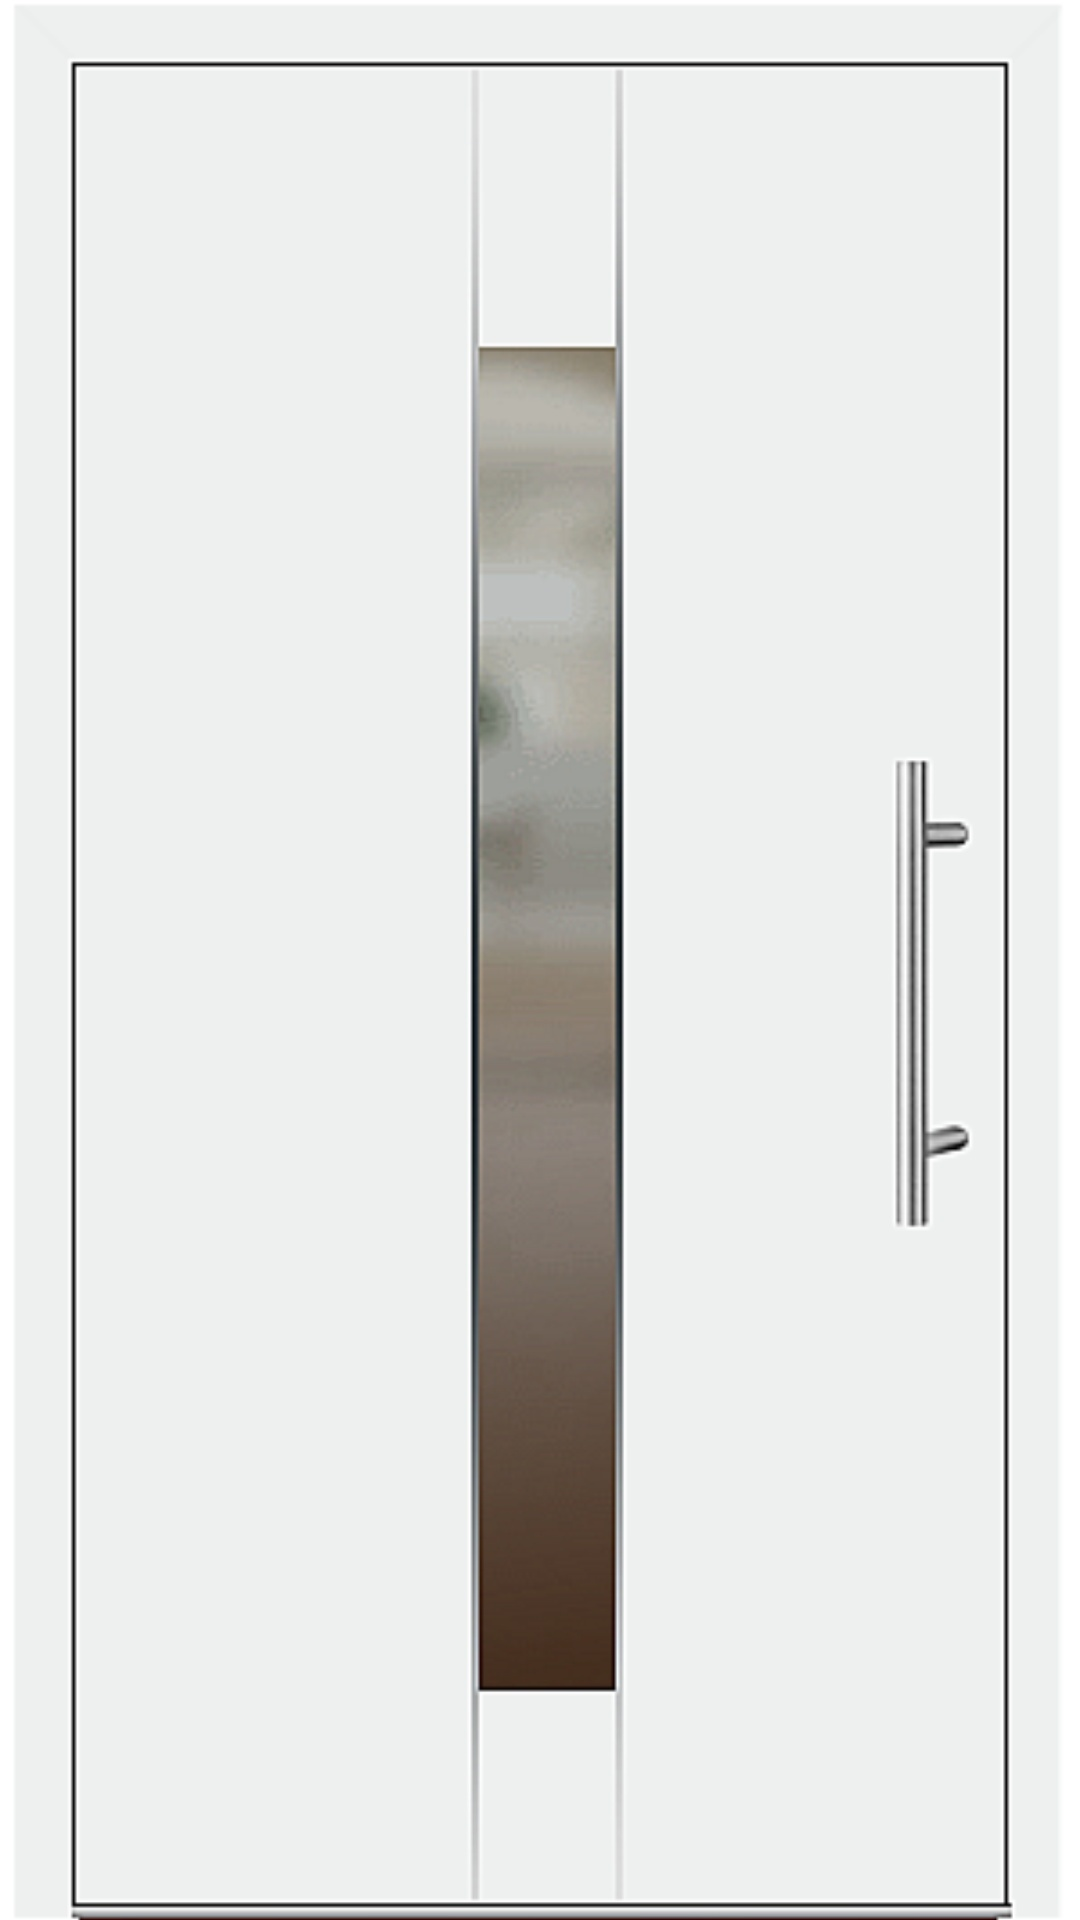 Aluminium Haustür Modell 6182-54 weiß